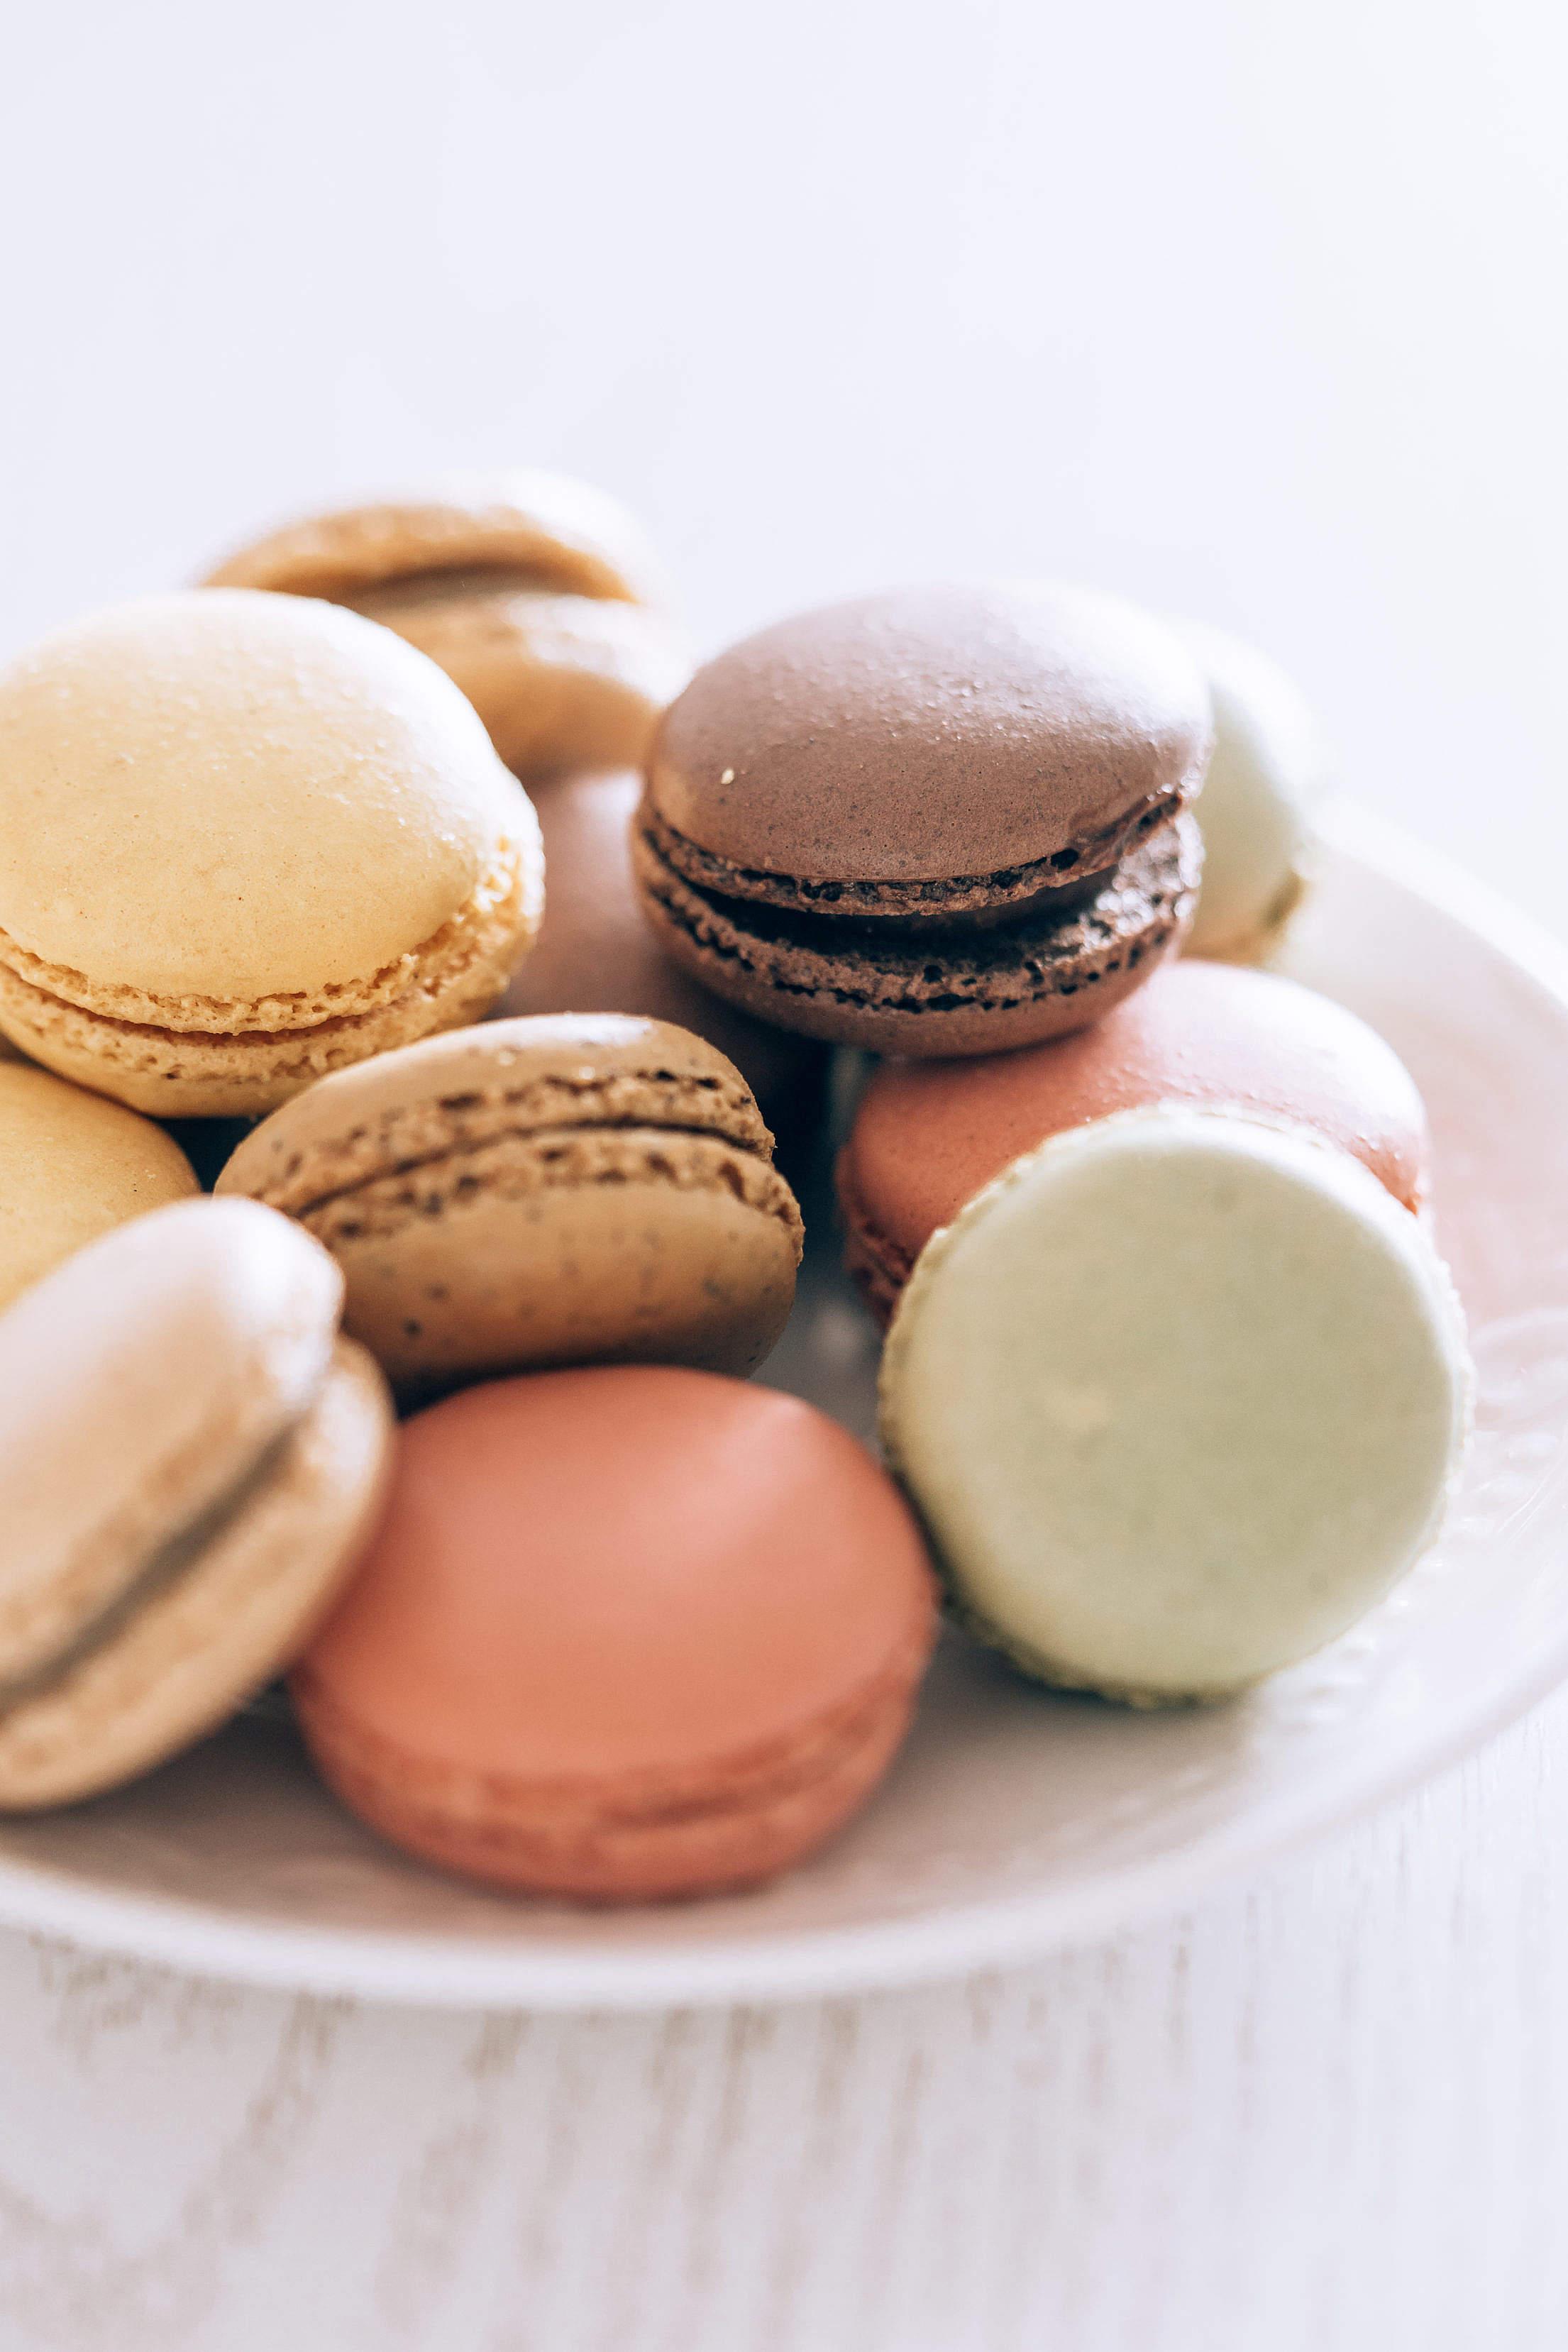 Homemade Macarons on a Plate Free Stock Photo